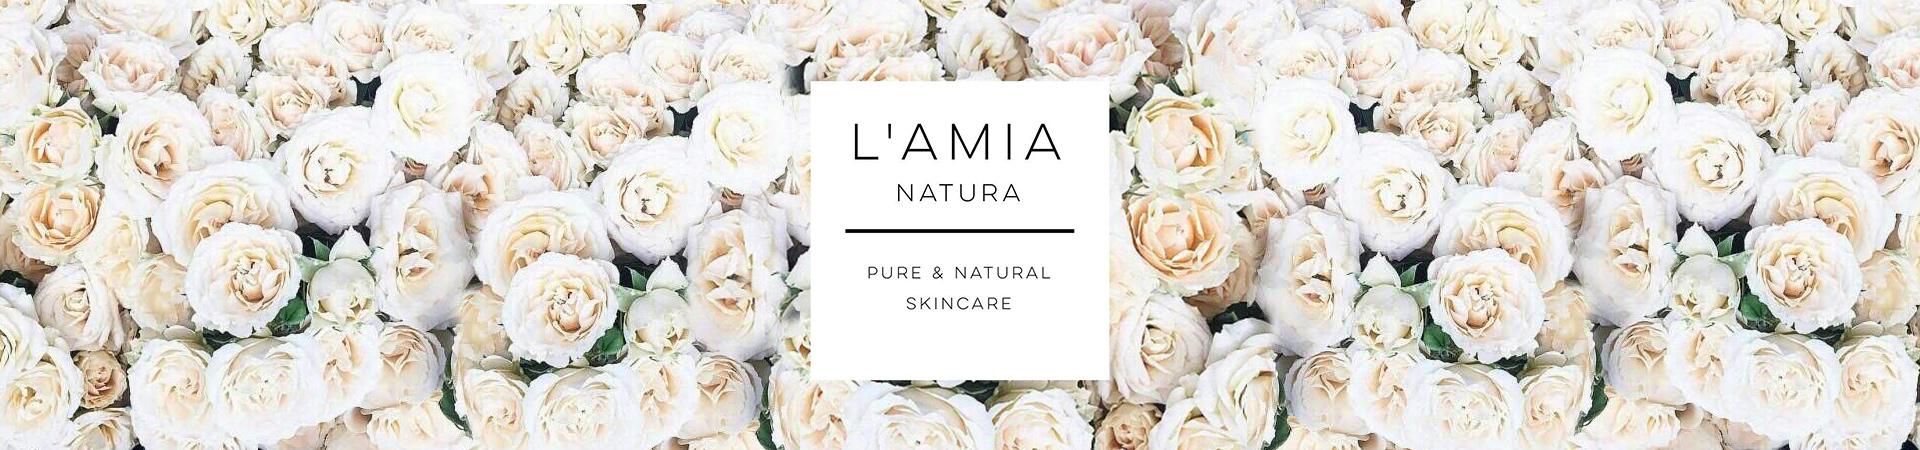 lamia cosmetics